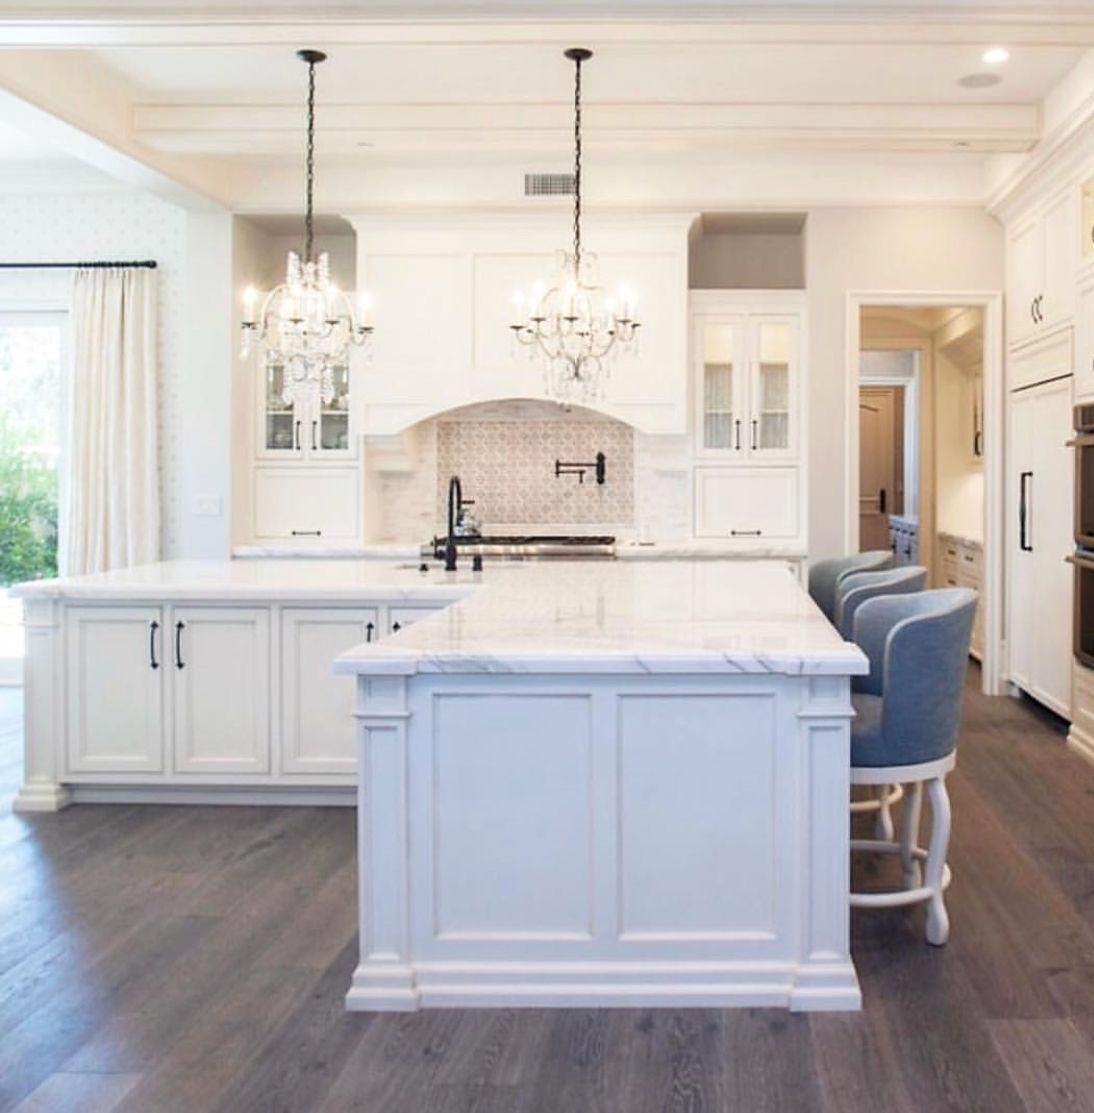 l shaped island kitchen designs layout home interior design kitchen layout on kitchen island ideas v shape id=27531